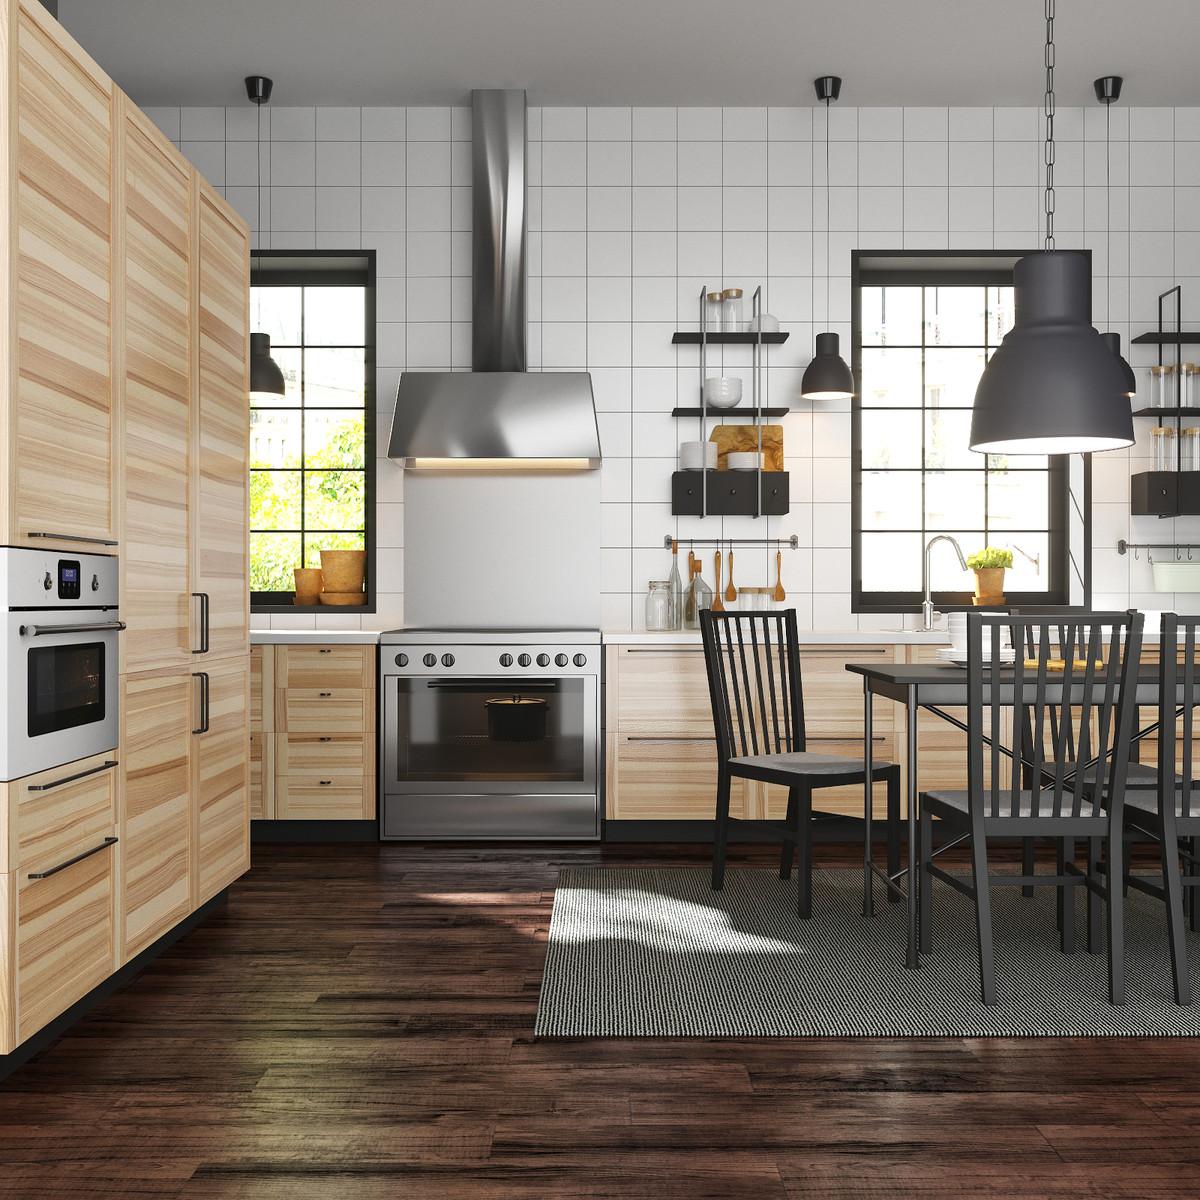 Cuisine Ikea Metod Brokhult Permalink To Cool Des Photos De Photo